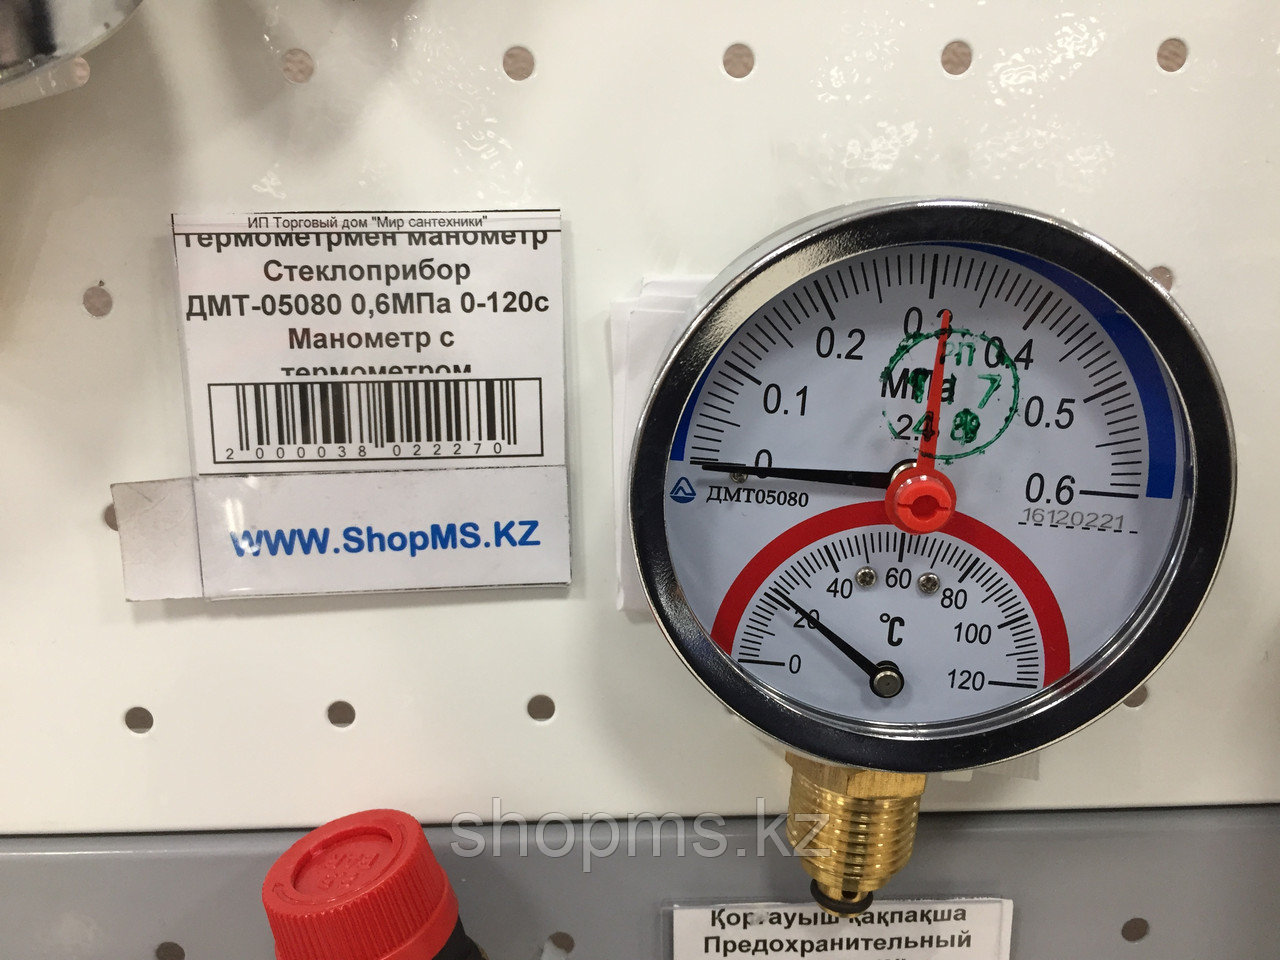 Манометр с термометром Стеклоприбор ДМТ-05080 1МПа 0-120с